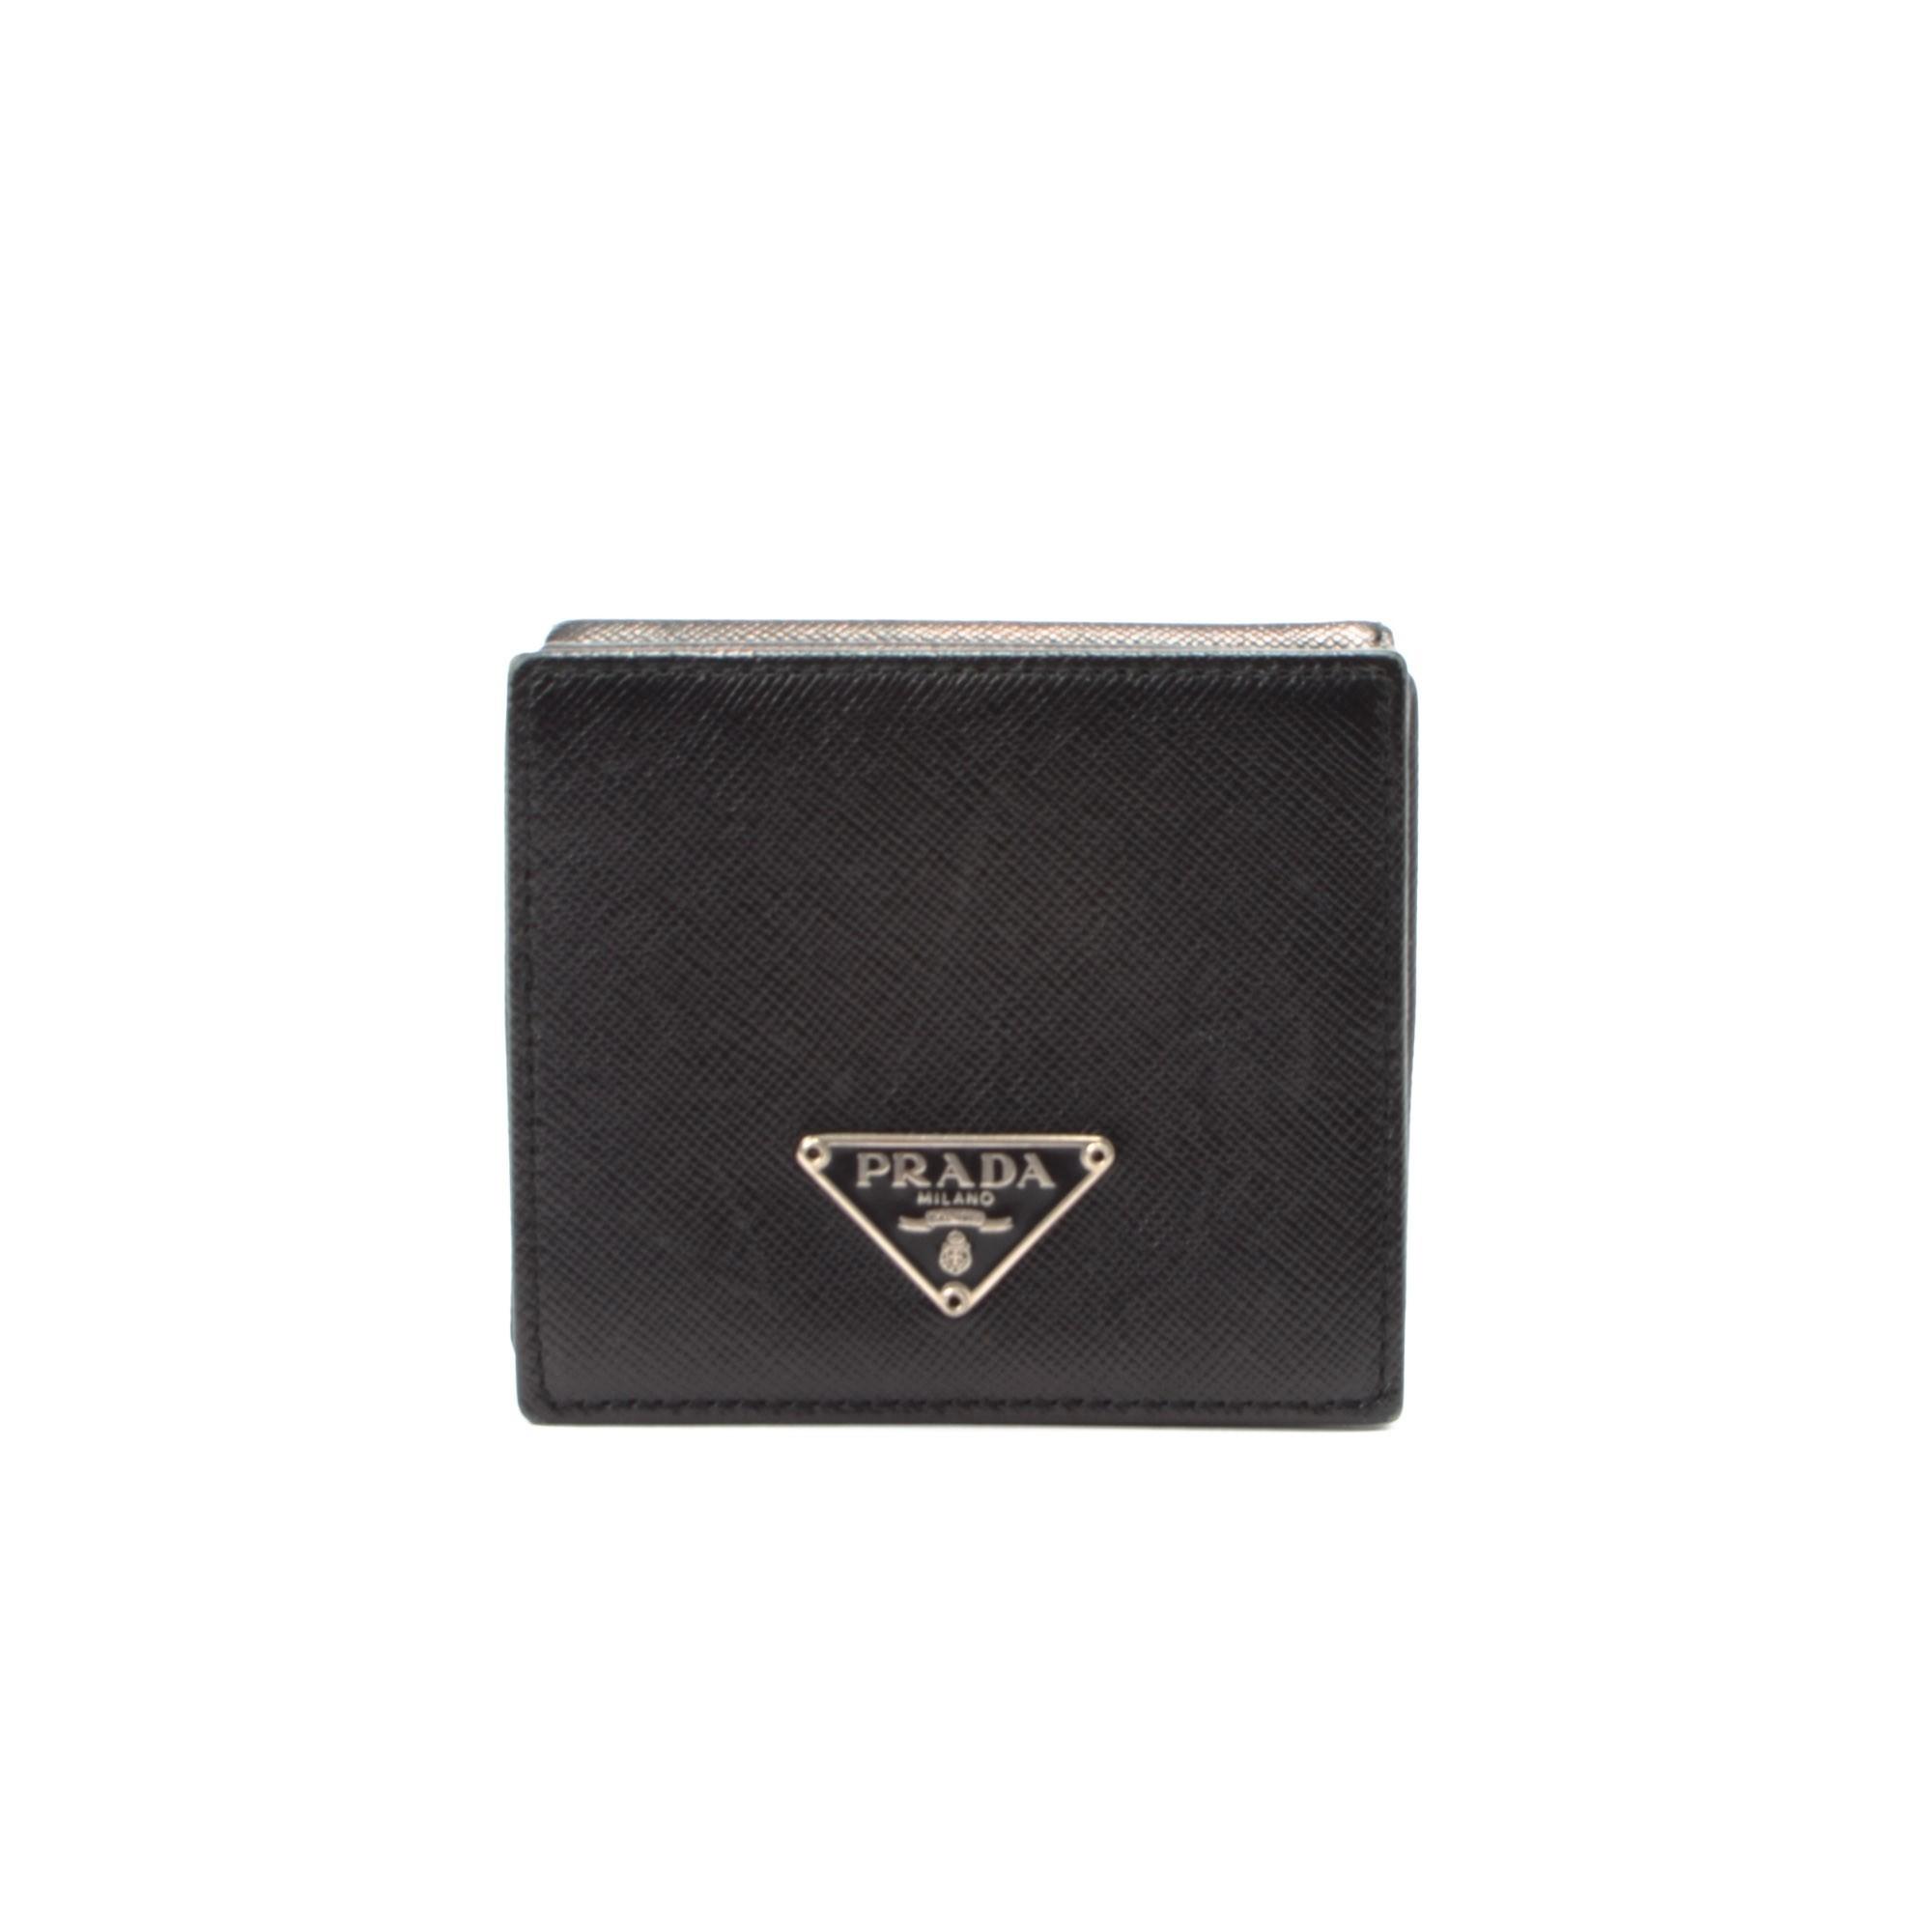 prada handbag blue - Prada Coin Case Saffiano Black Calf Wallet - LXR\u0026amp;CO Vintage Luxury